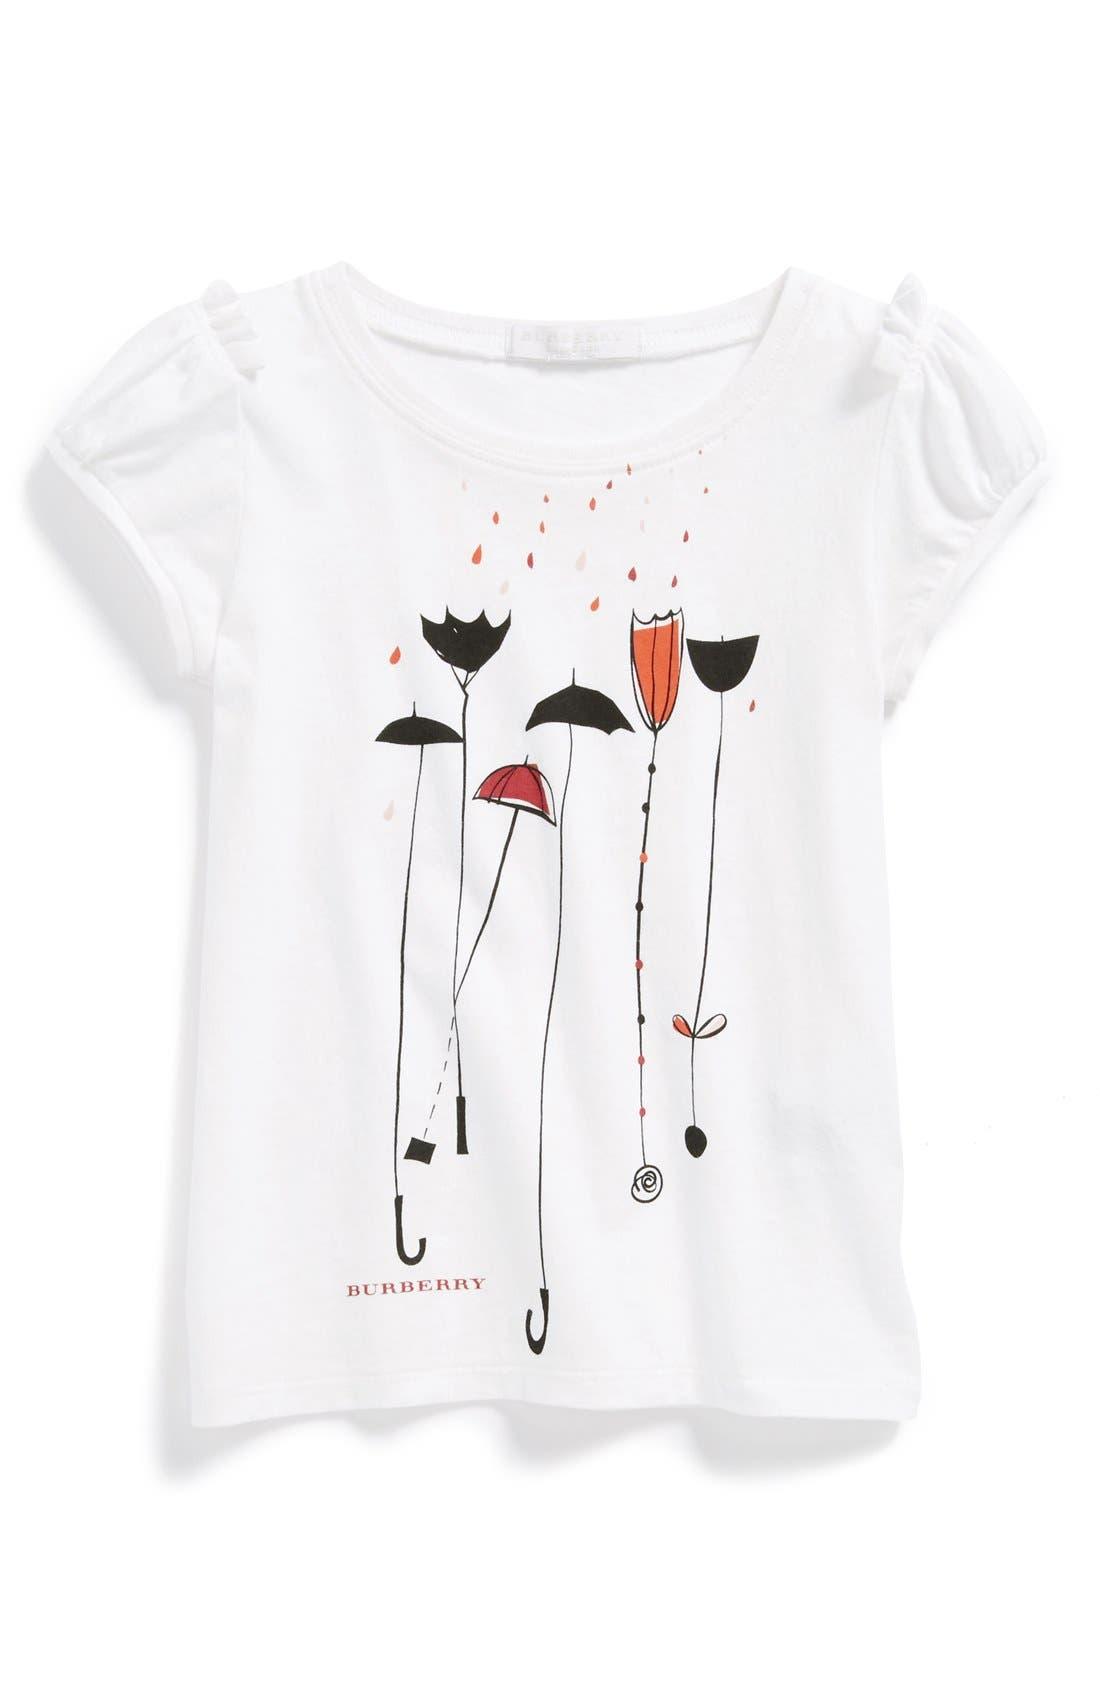 Alternate Image 1 Selected - Burberry Graphic Tee (Little Girls & Big Girls)